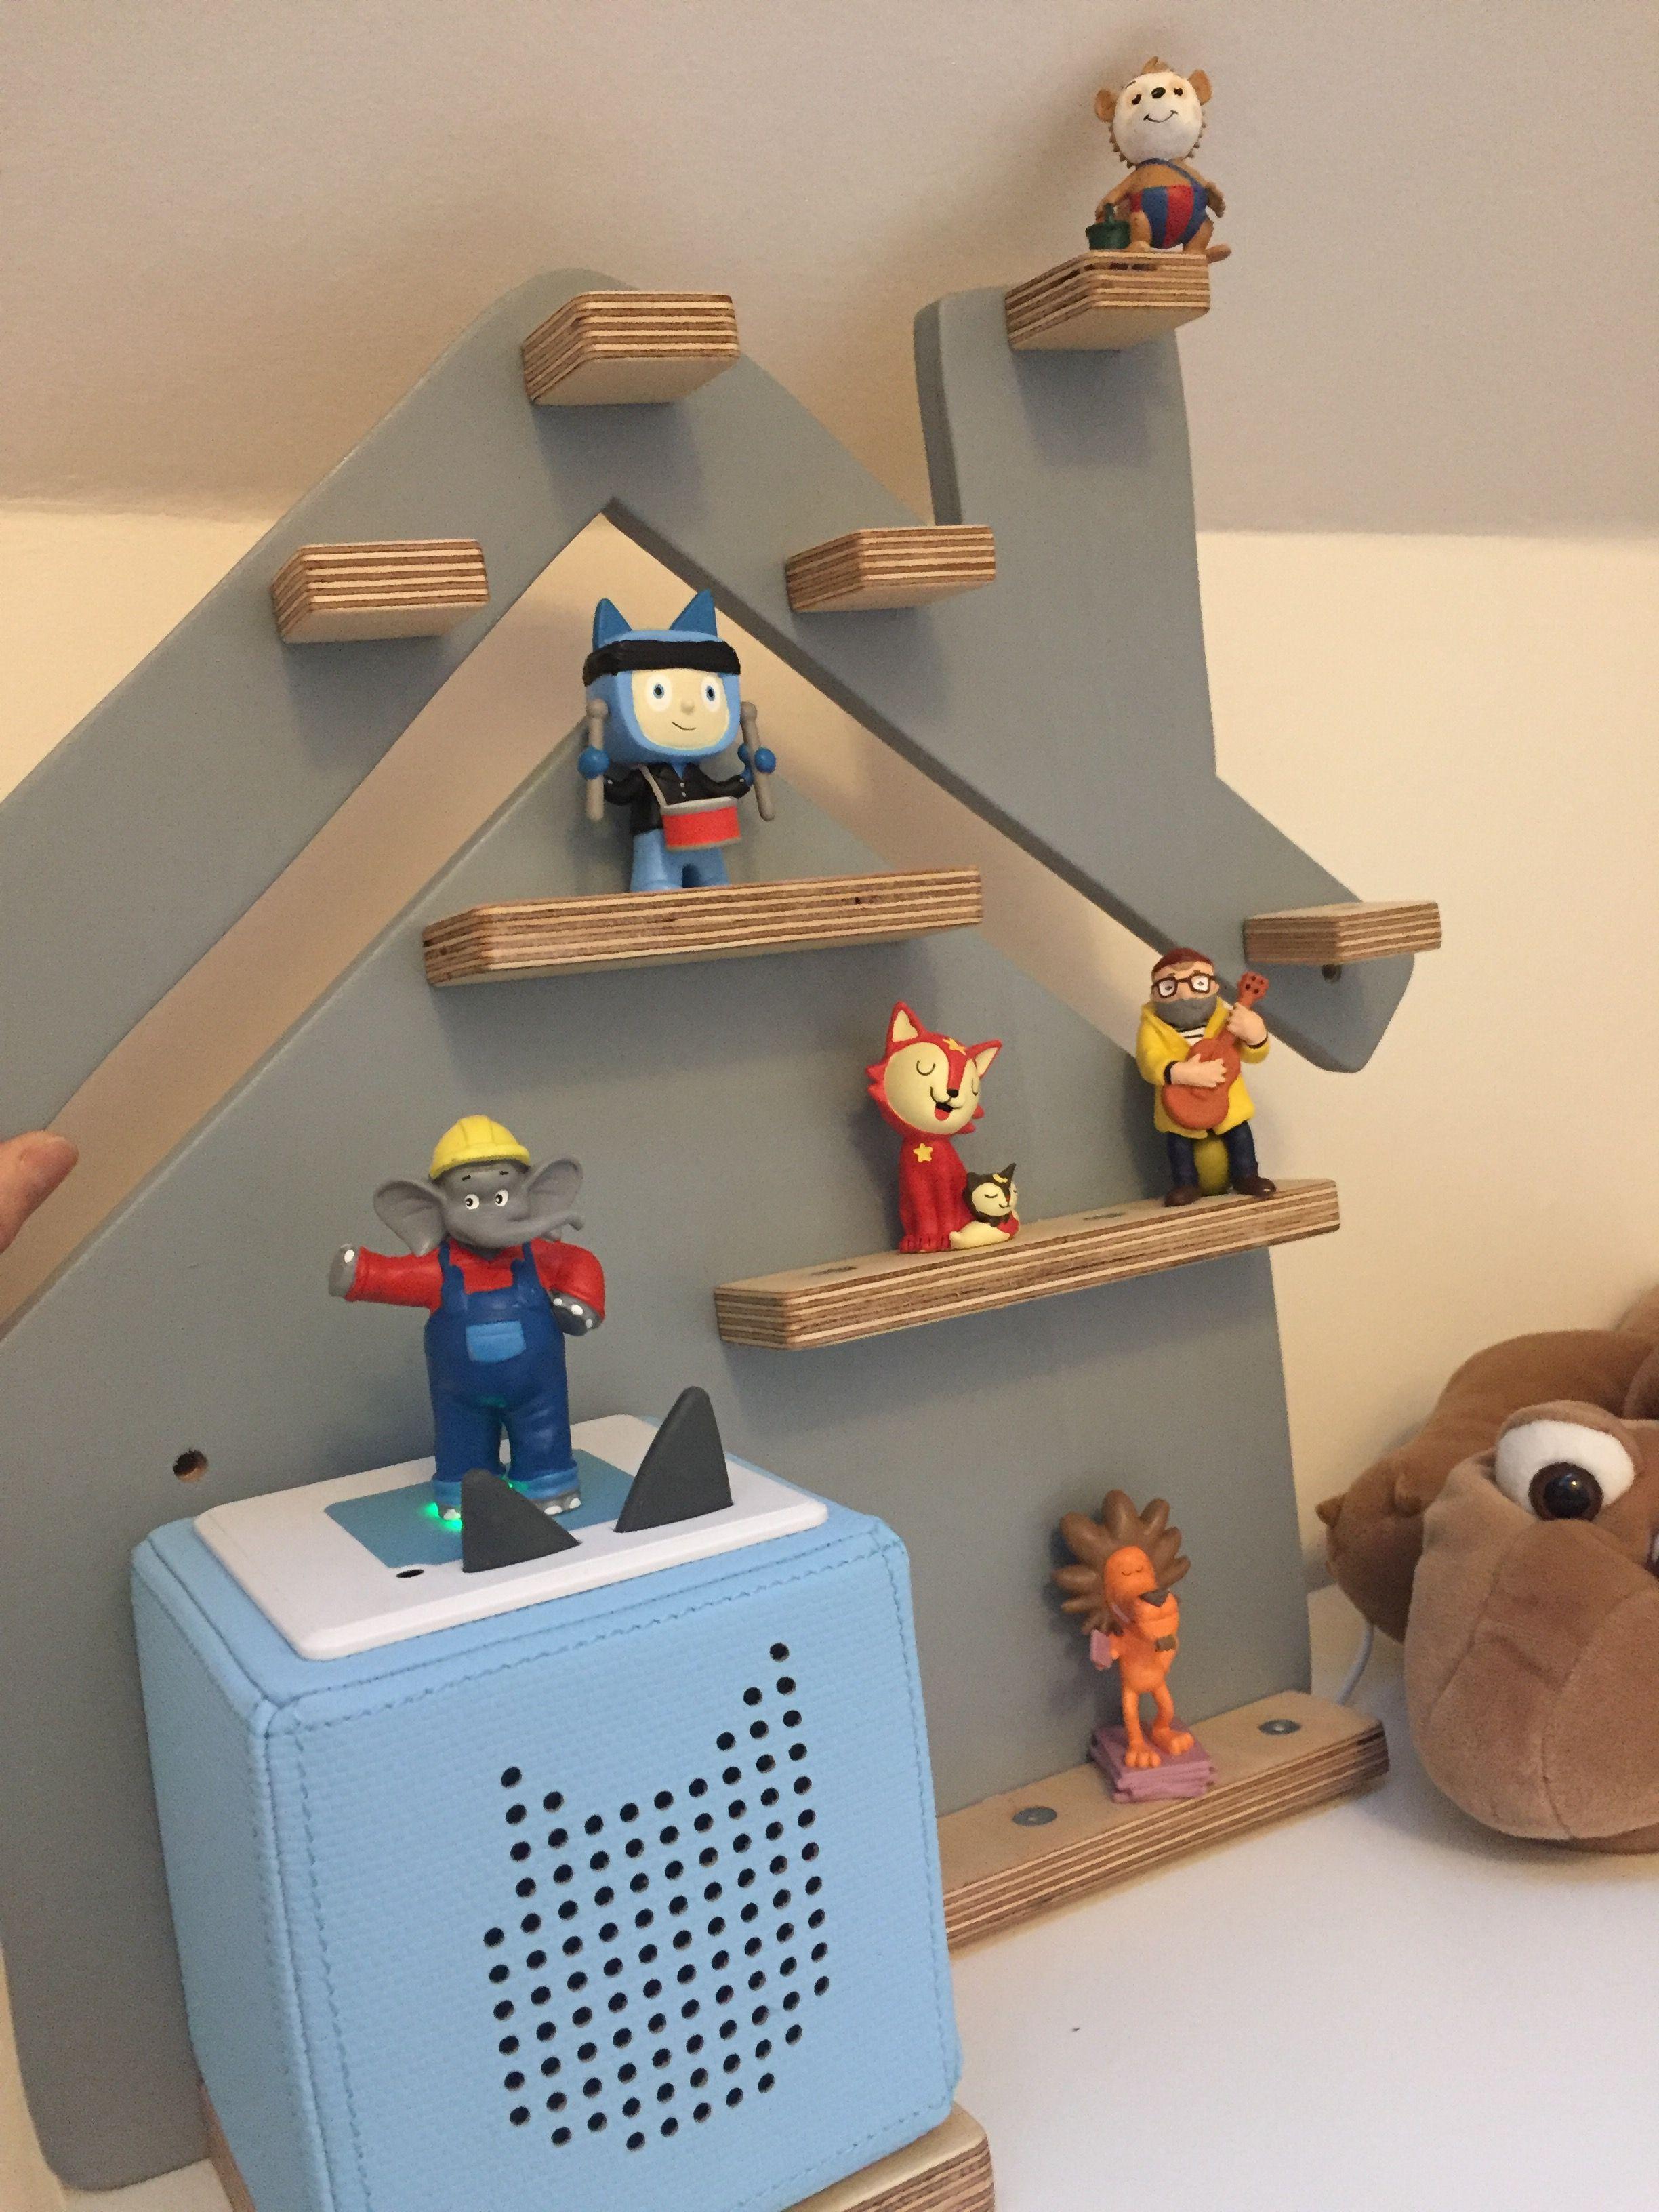 This New Ikea Shelf Is Nice For Displaying Minifigures Ikea